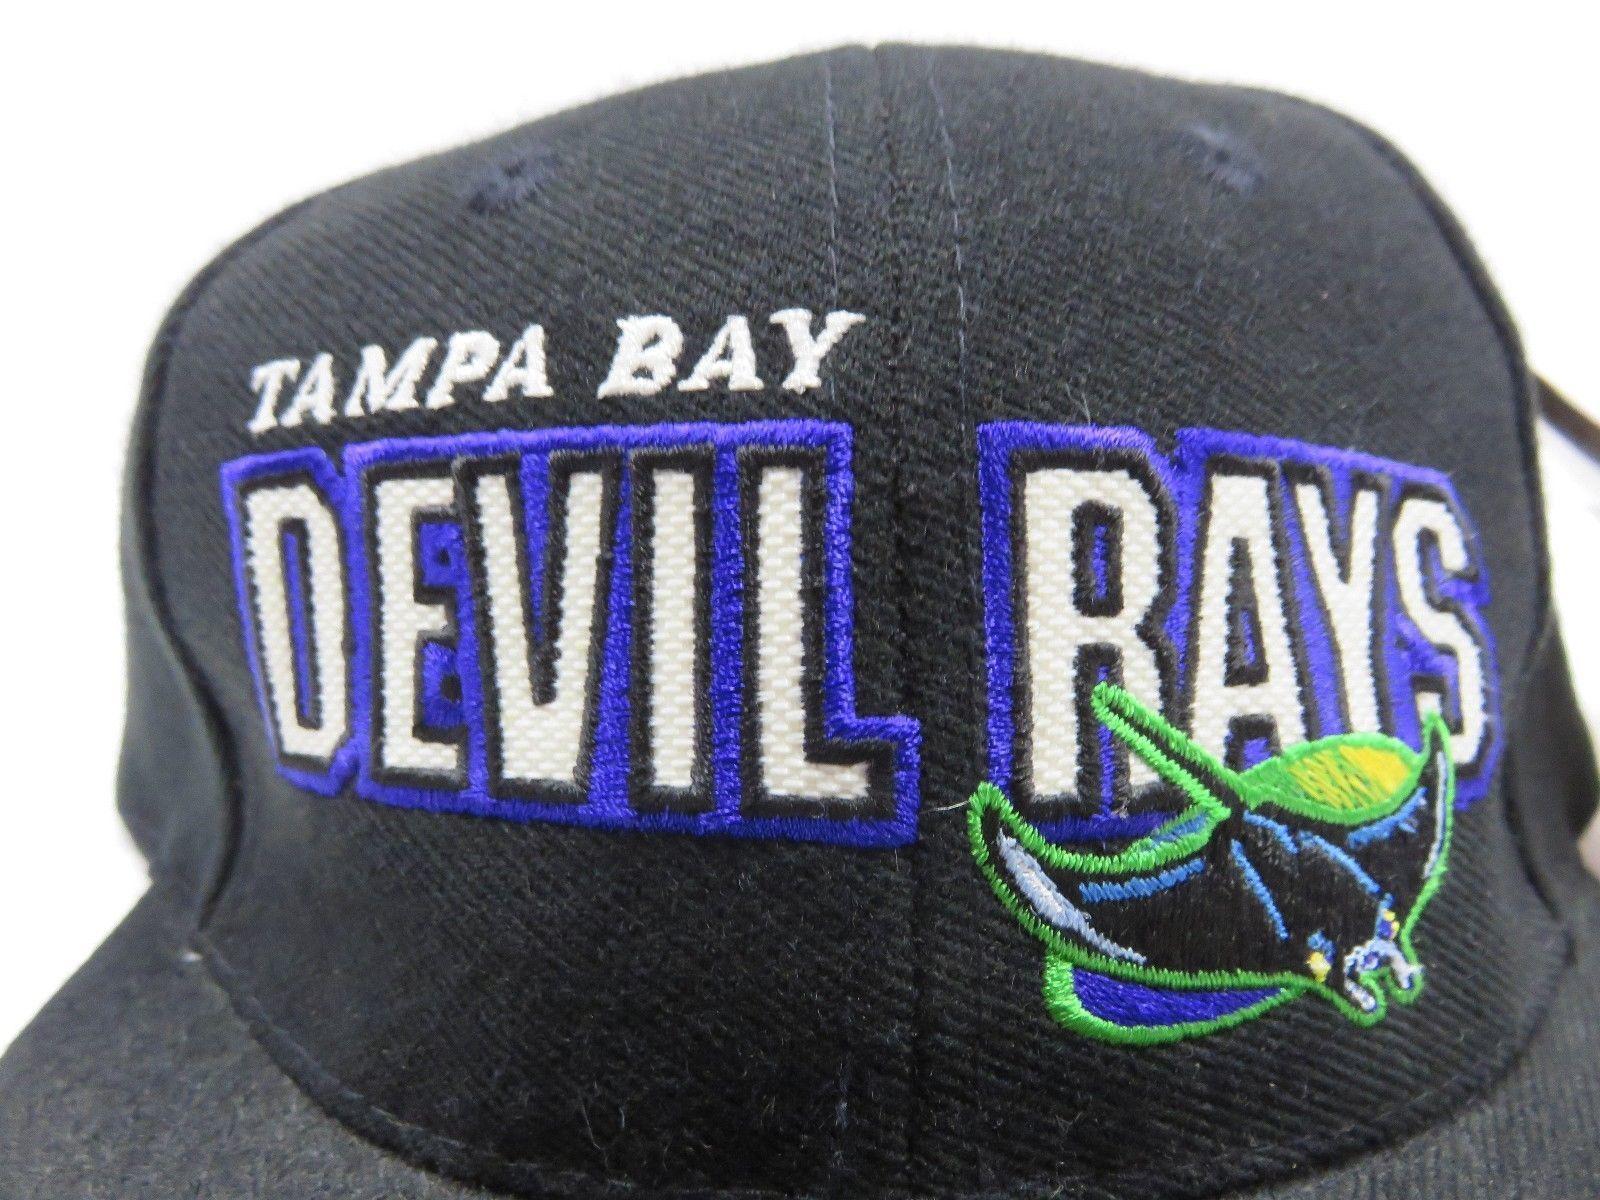 90s Tampa Bay Devil Rays MLB Black Baseball Adjustable Snap Back Hat NOS w/ TAGS